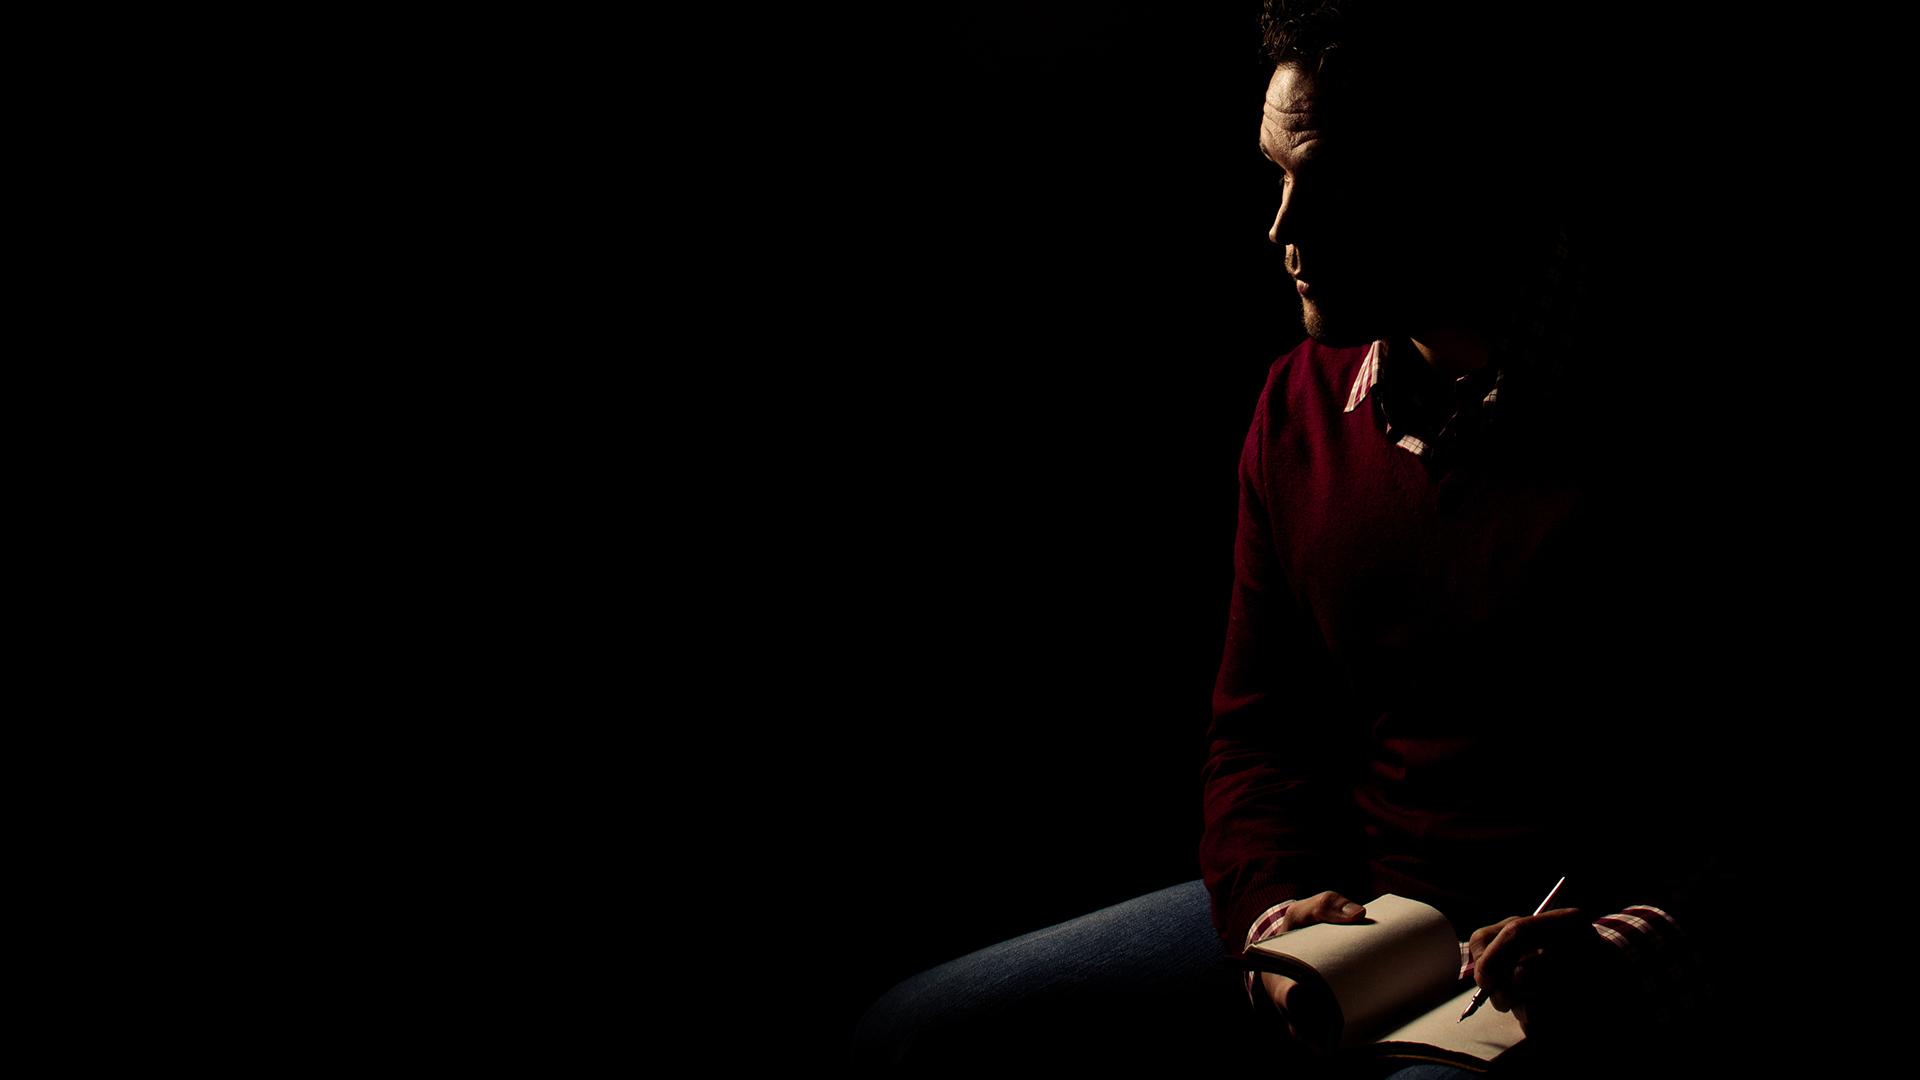 Someone writing in the dark